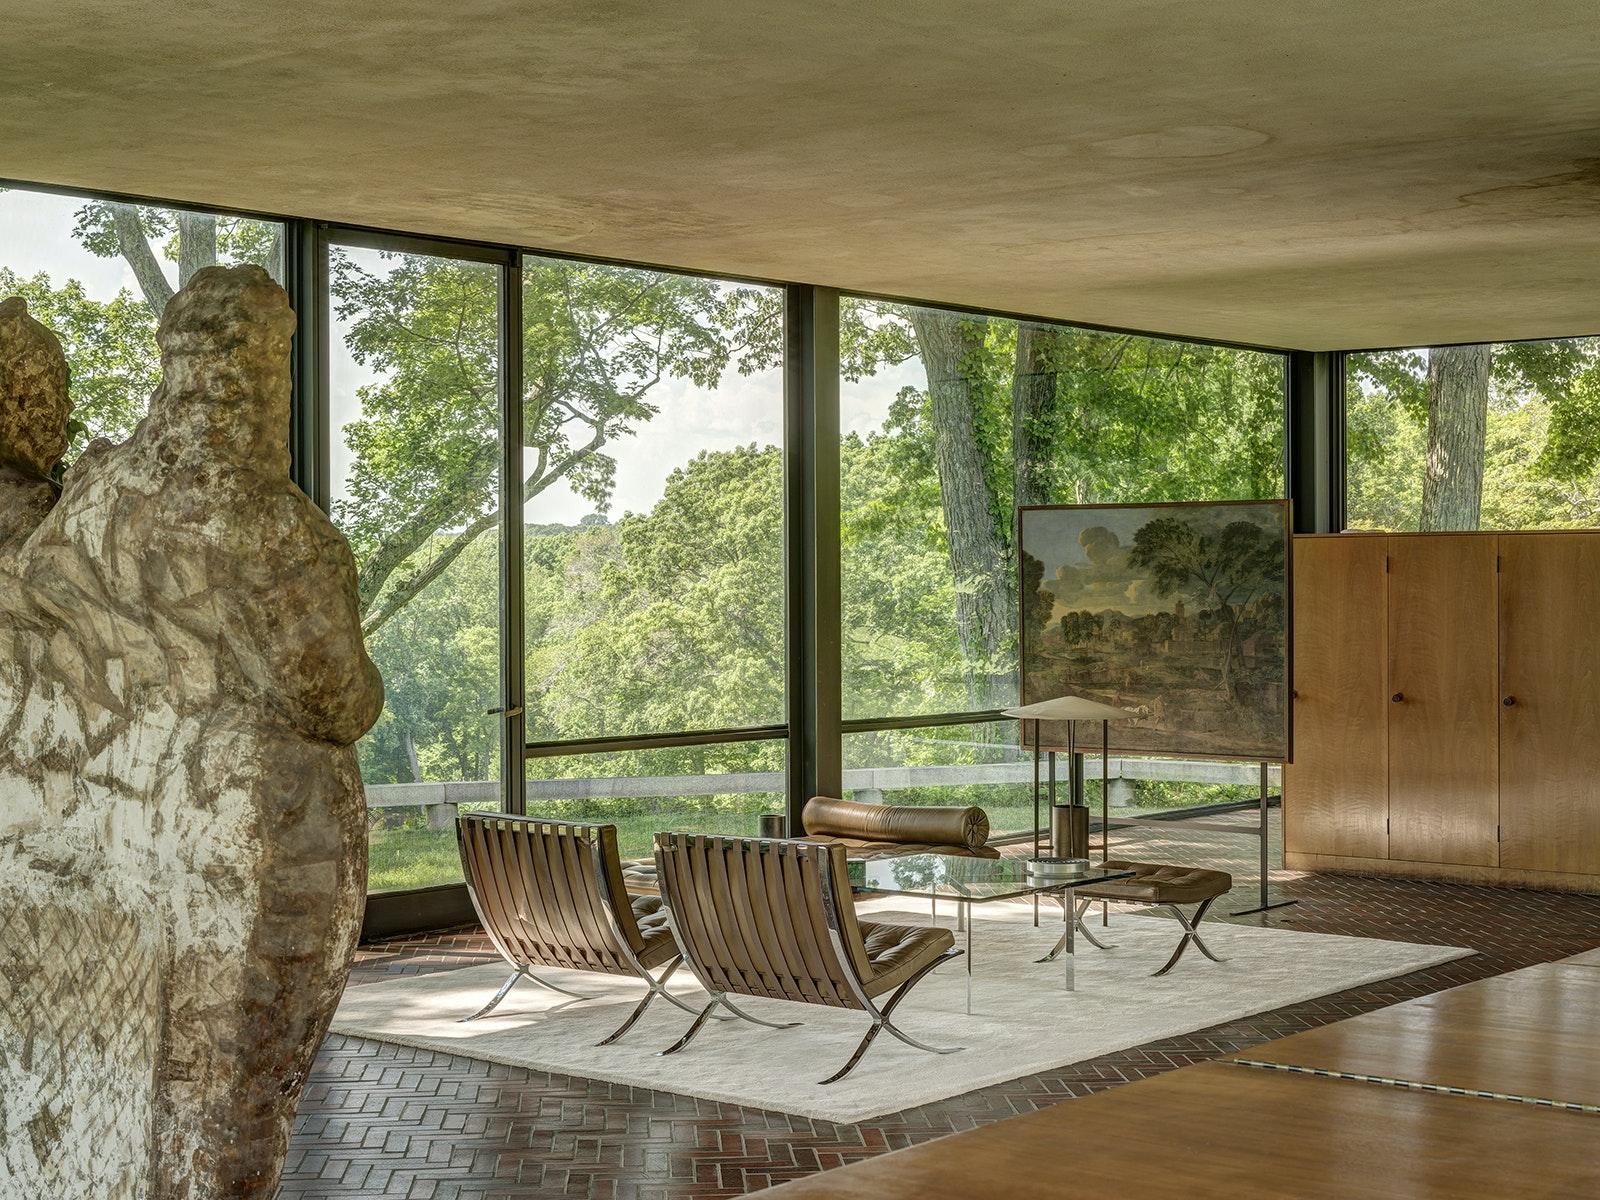 Seeking Mid Century Modern Design In The Eastern Usa